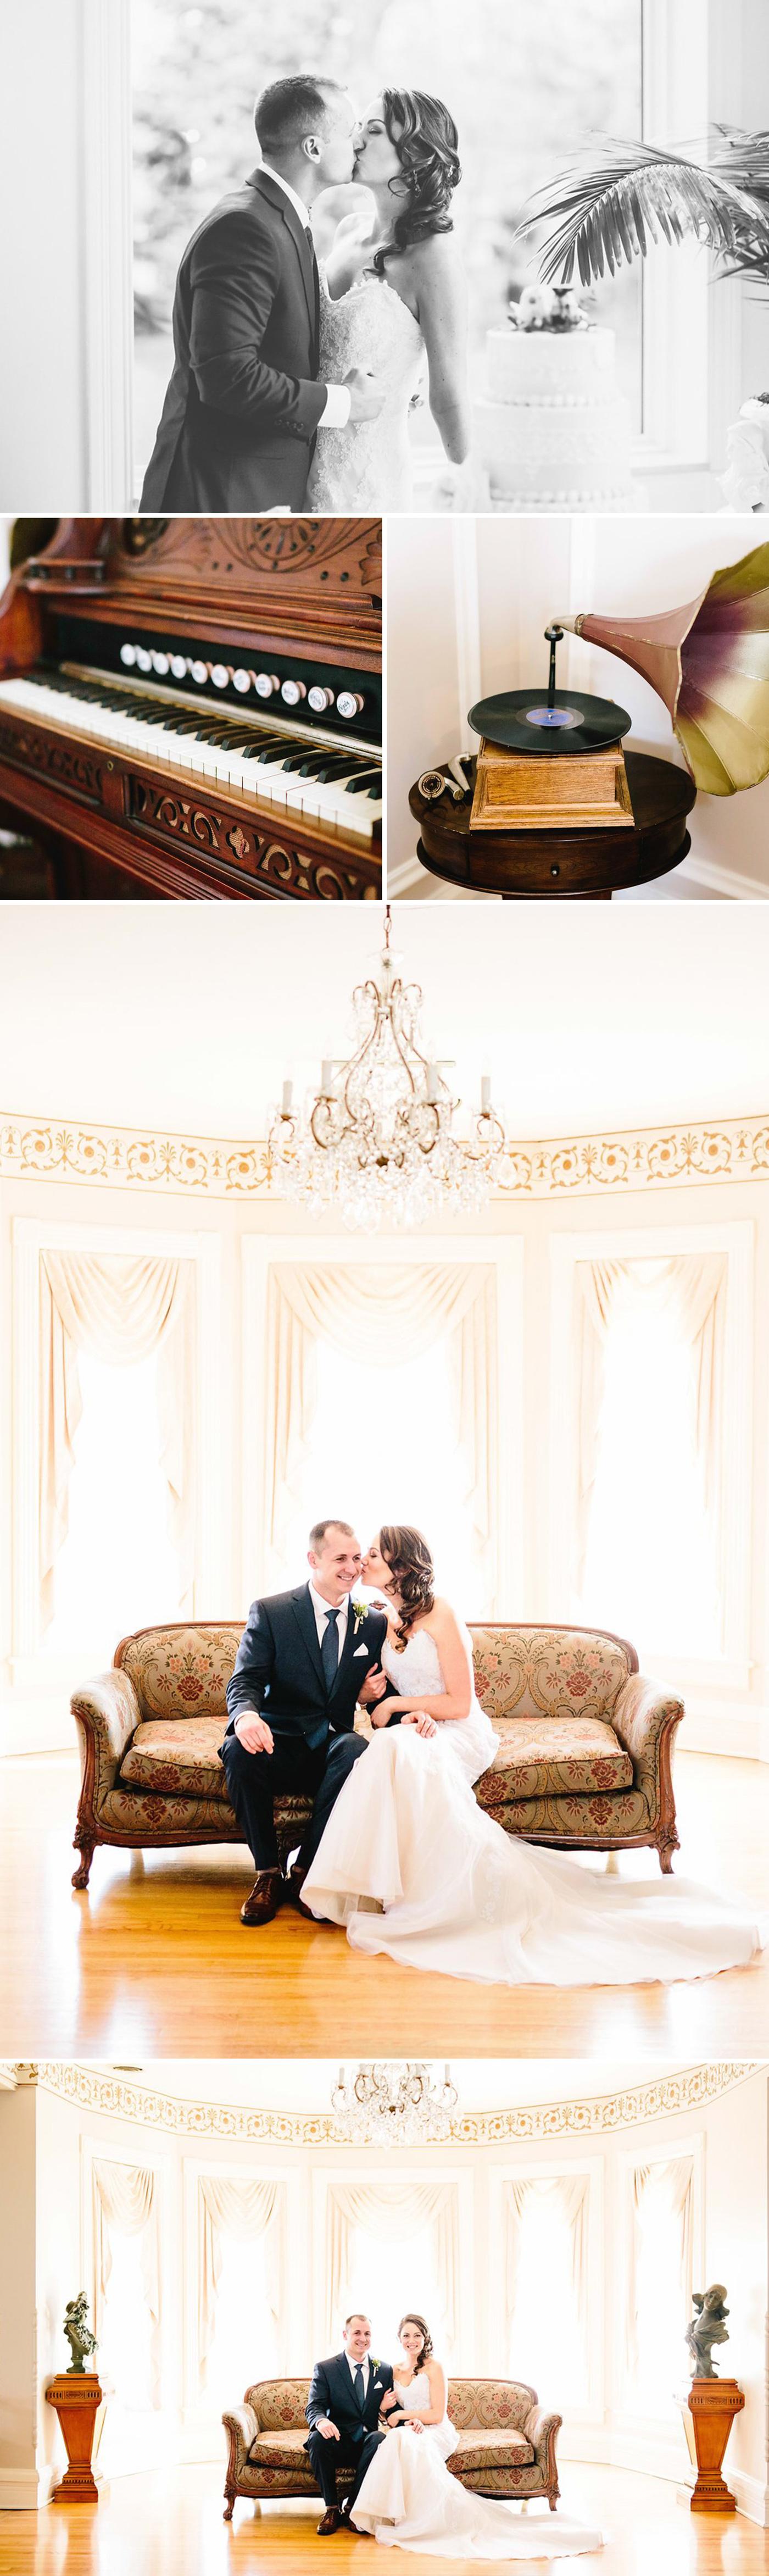 chicago-fine-art-wedding-photography-scallate4